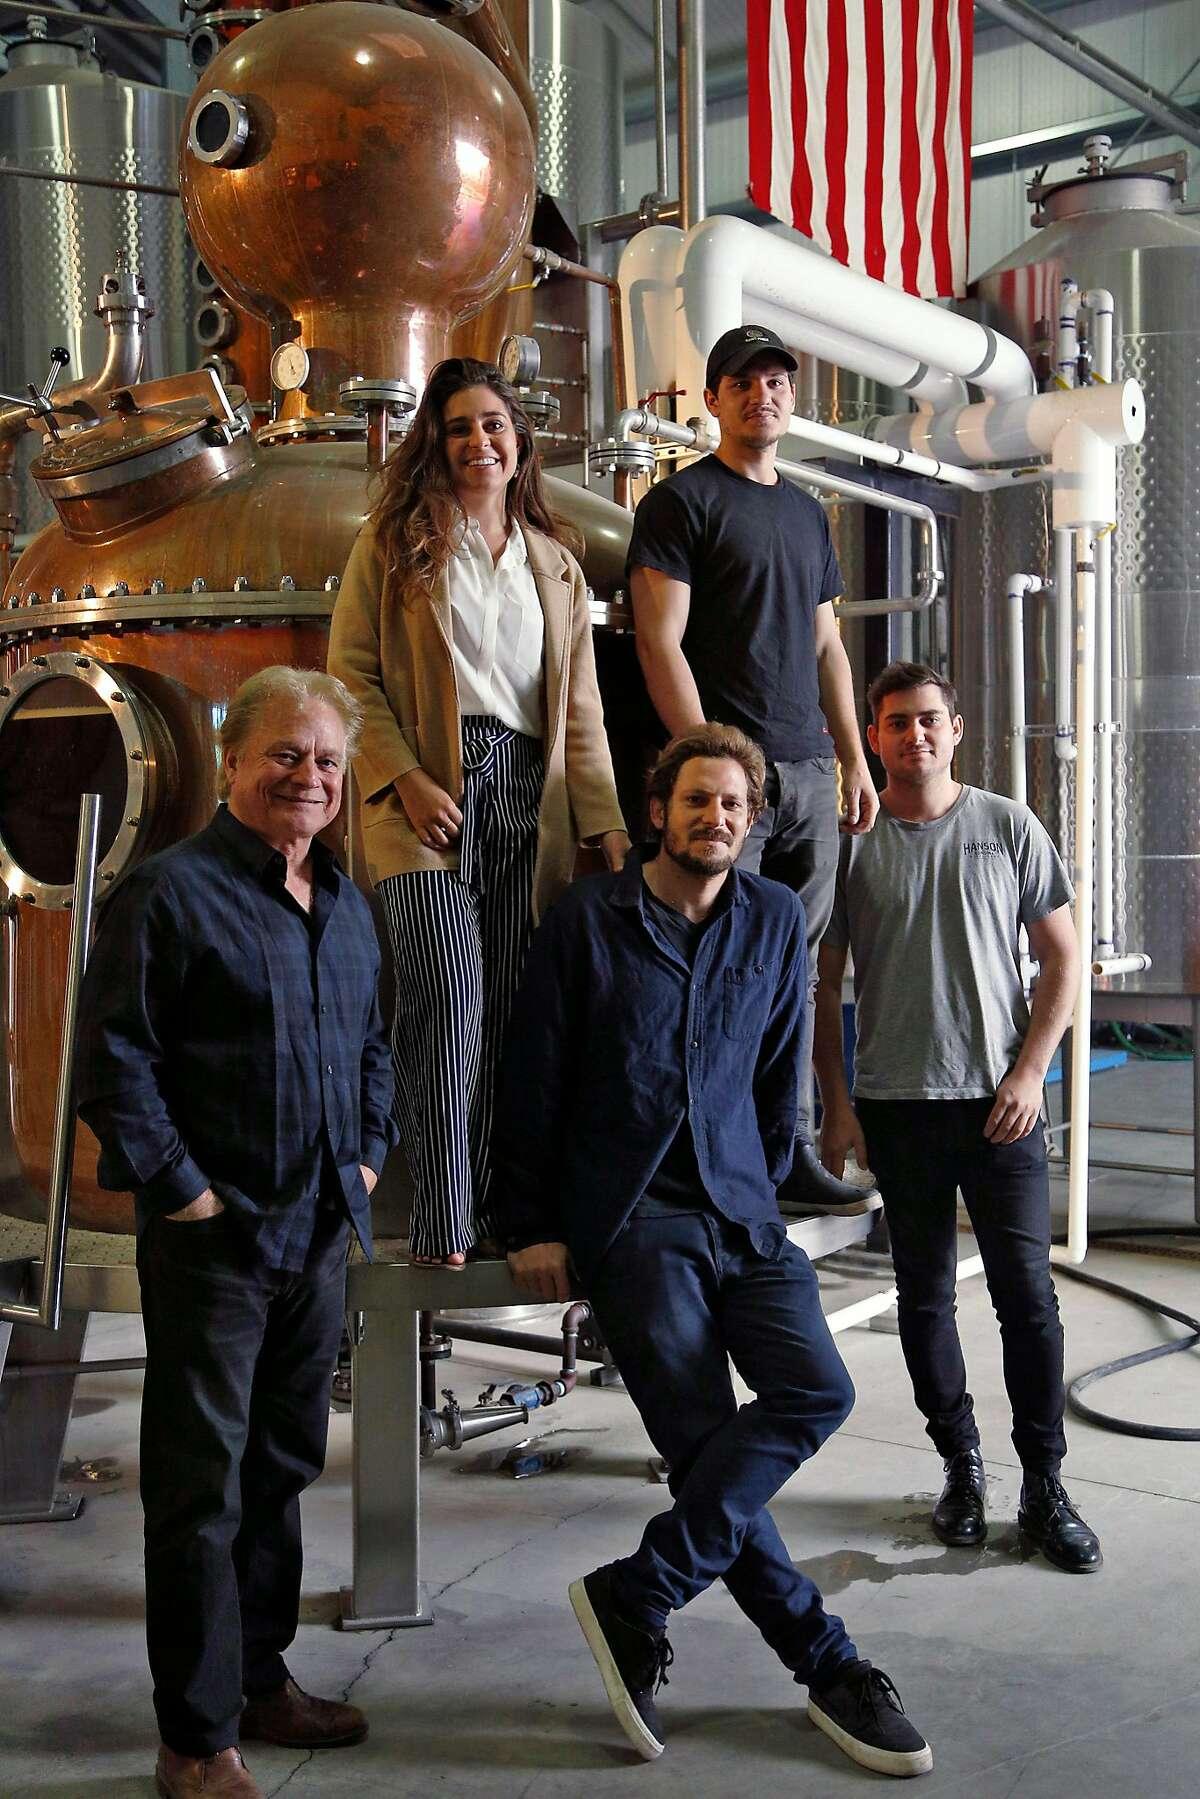 Scott Hanson and his children at Hanson Distillery in Sonoma, Calif., on Friday, September 28, 2018.